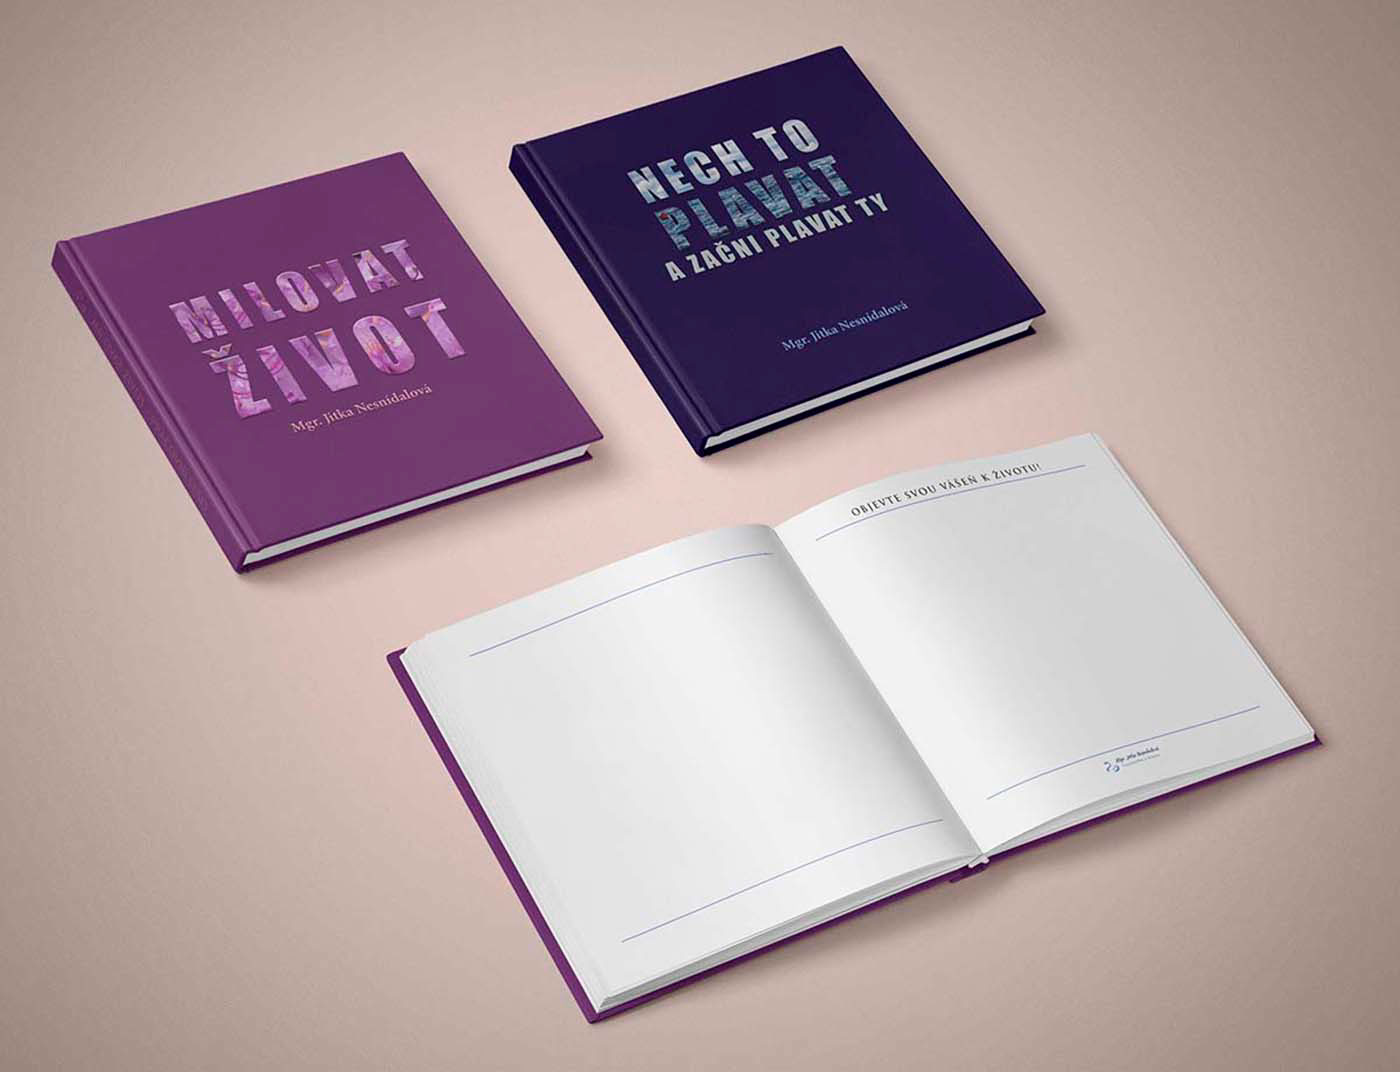 brand identity logo graphic stylisation psychology coaching Small Buisness brand swan bird motivation Gadget t/shirt book mark cover stationary